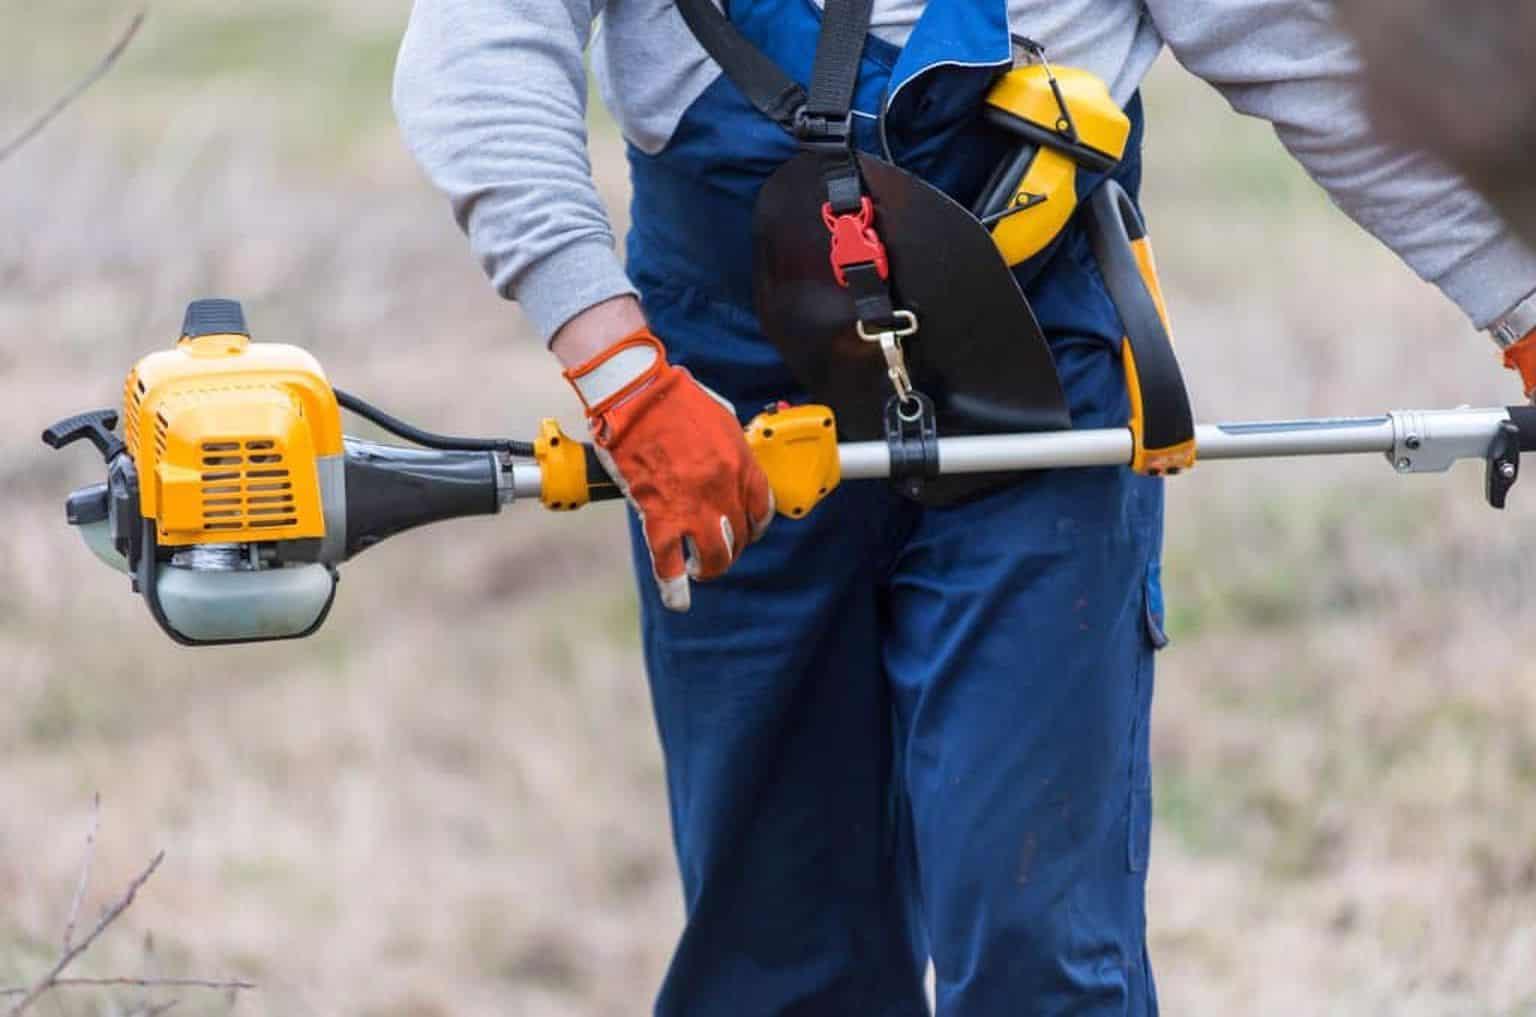 Man holding a gas powered pole saw